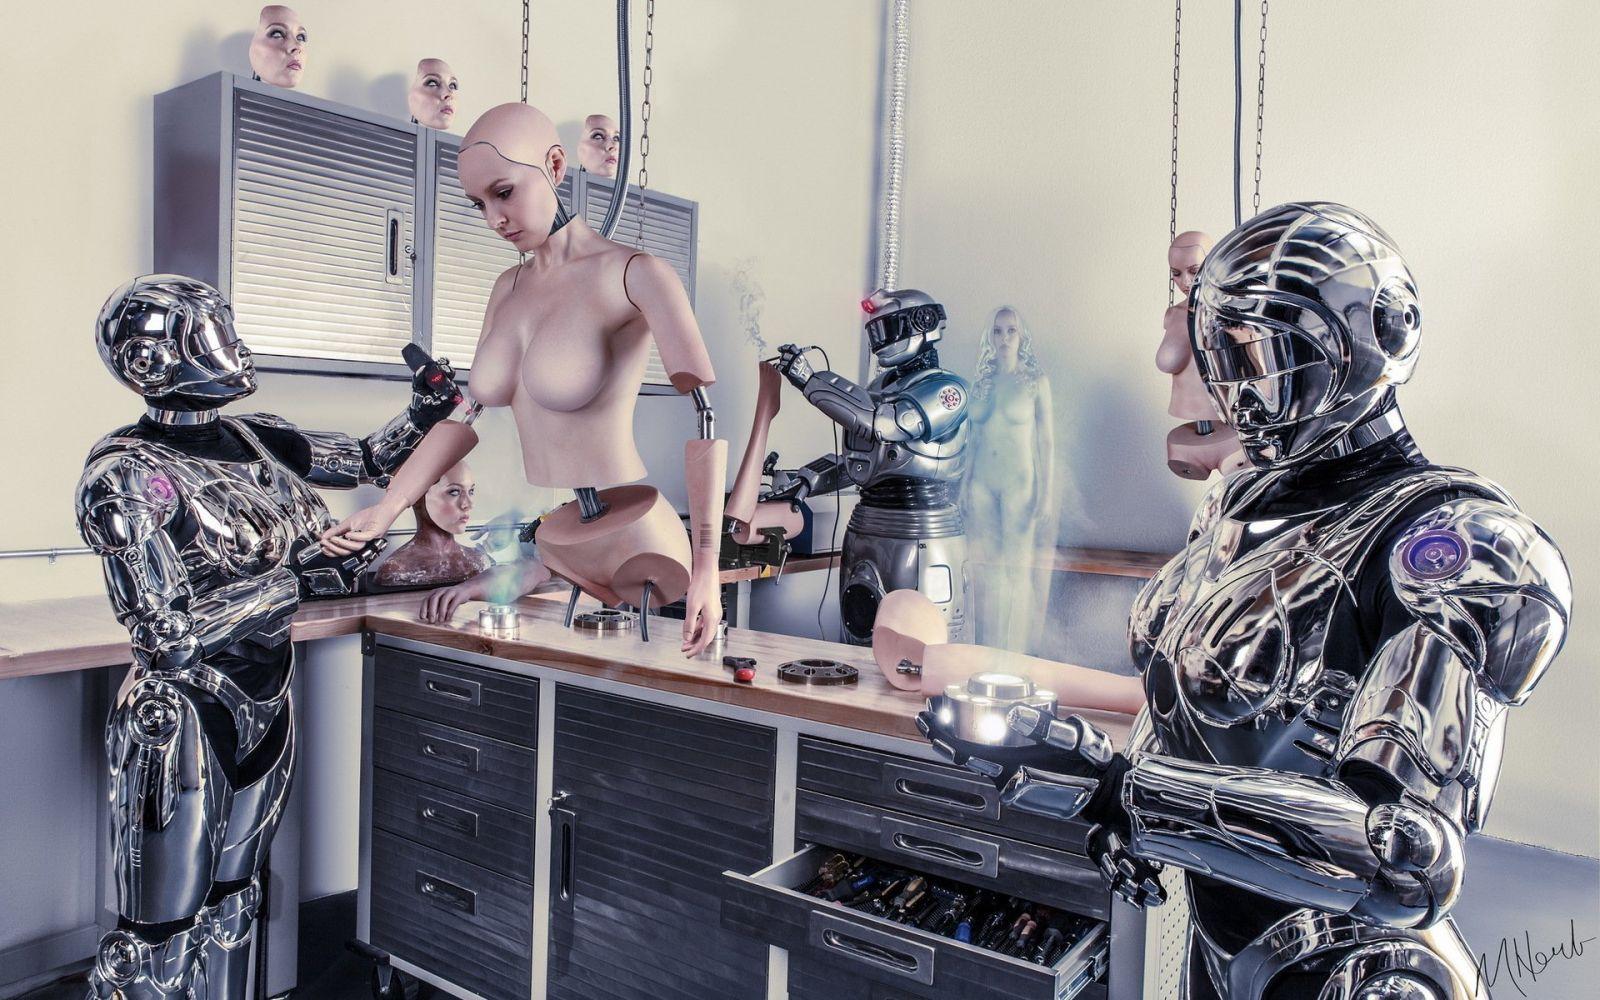 summer-love-sexy-movie-robots-piss